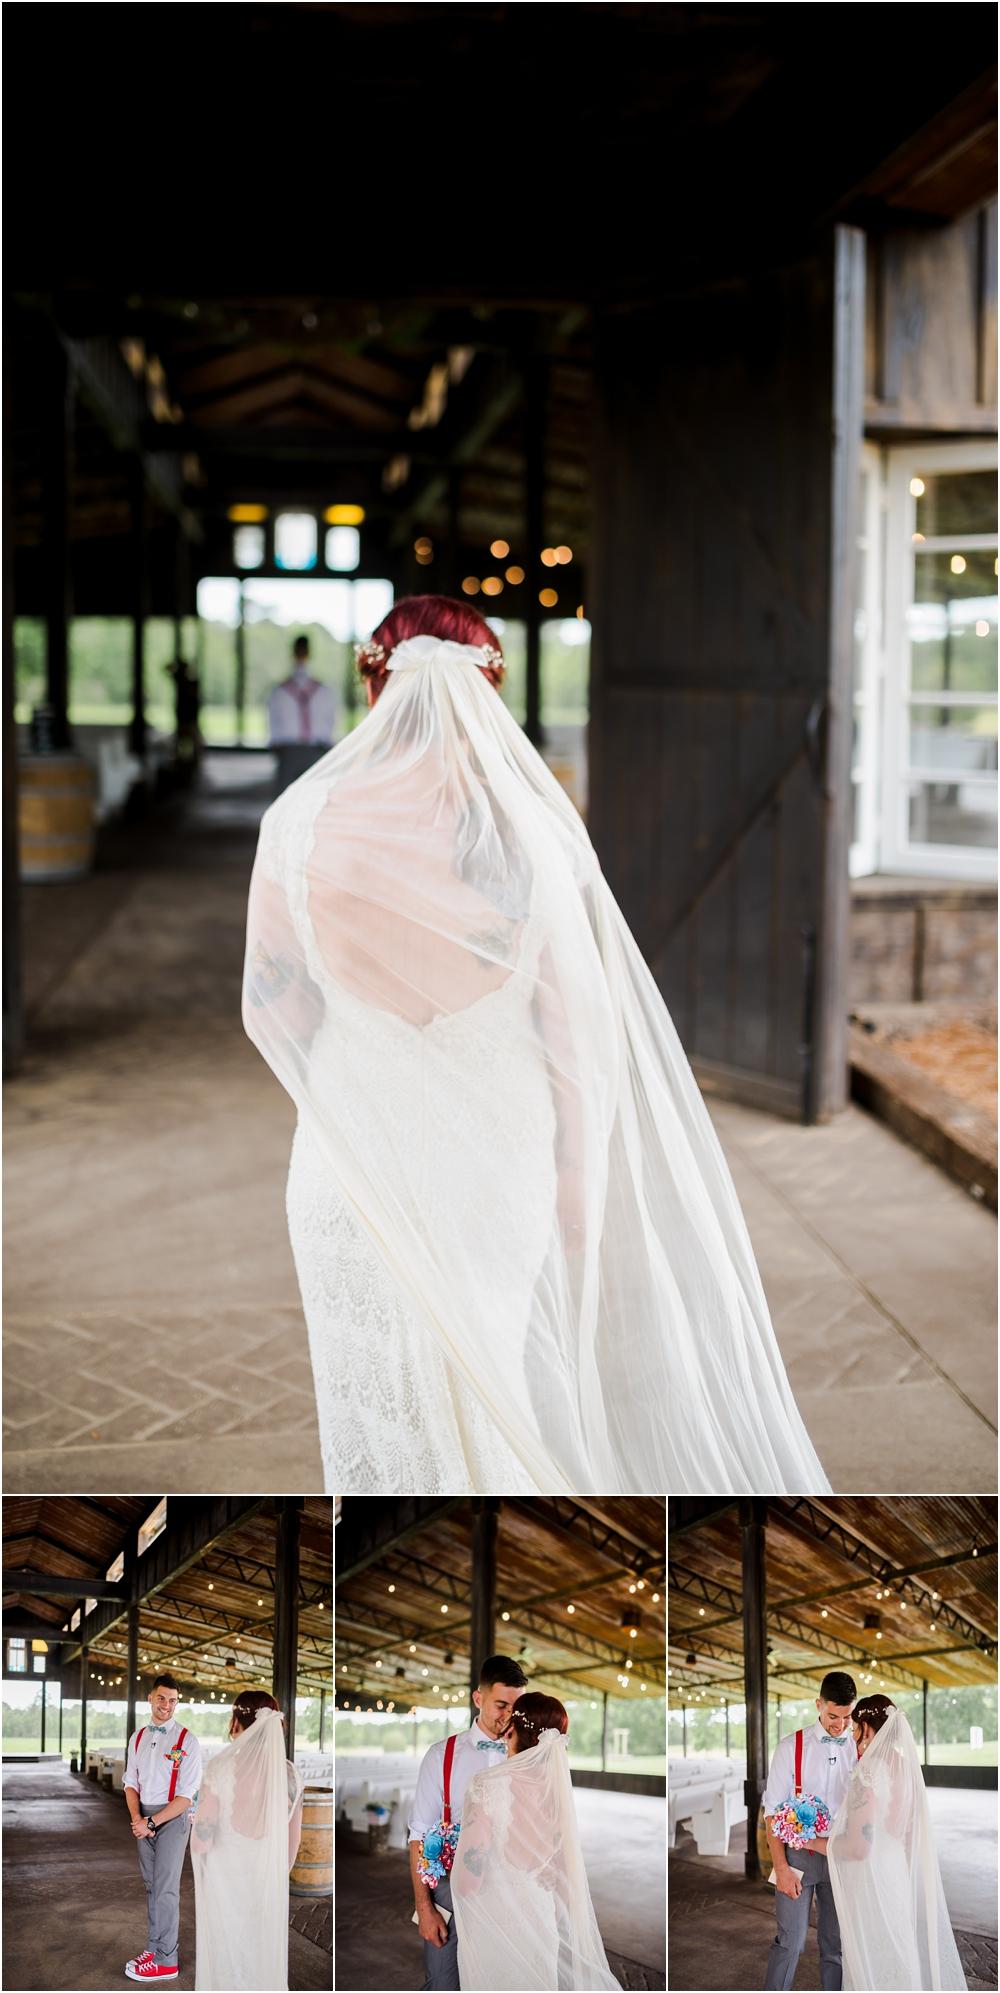 the-barn-at-wateroaks-circus-florida-wedding-photographer-kiersten-stevenson-photography-47.jpg